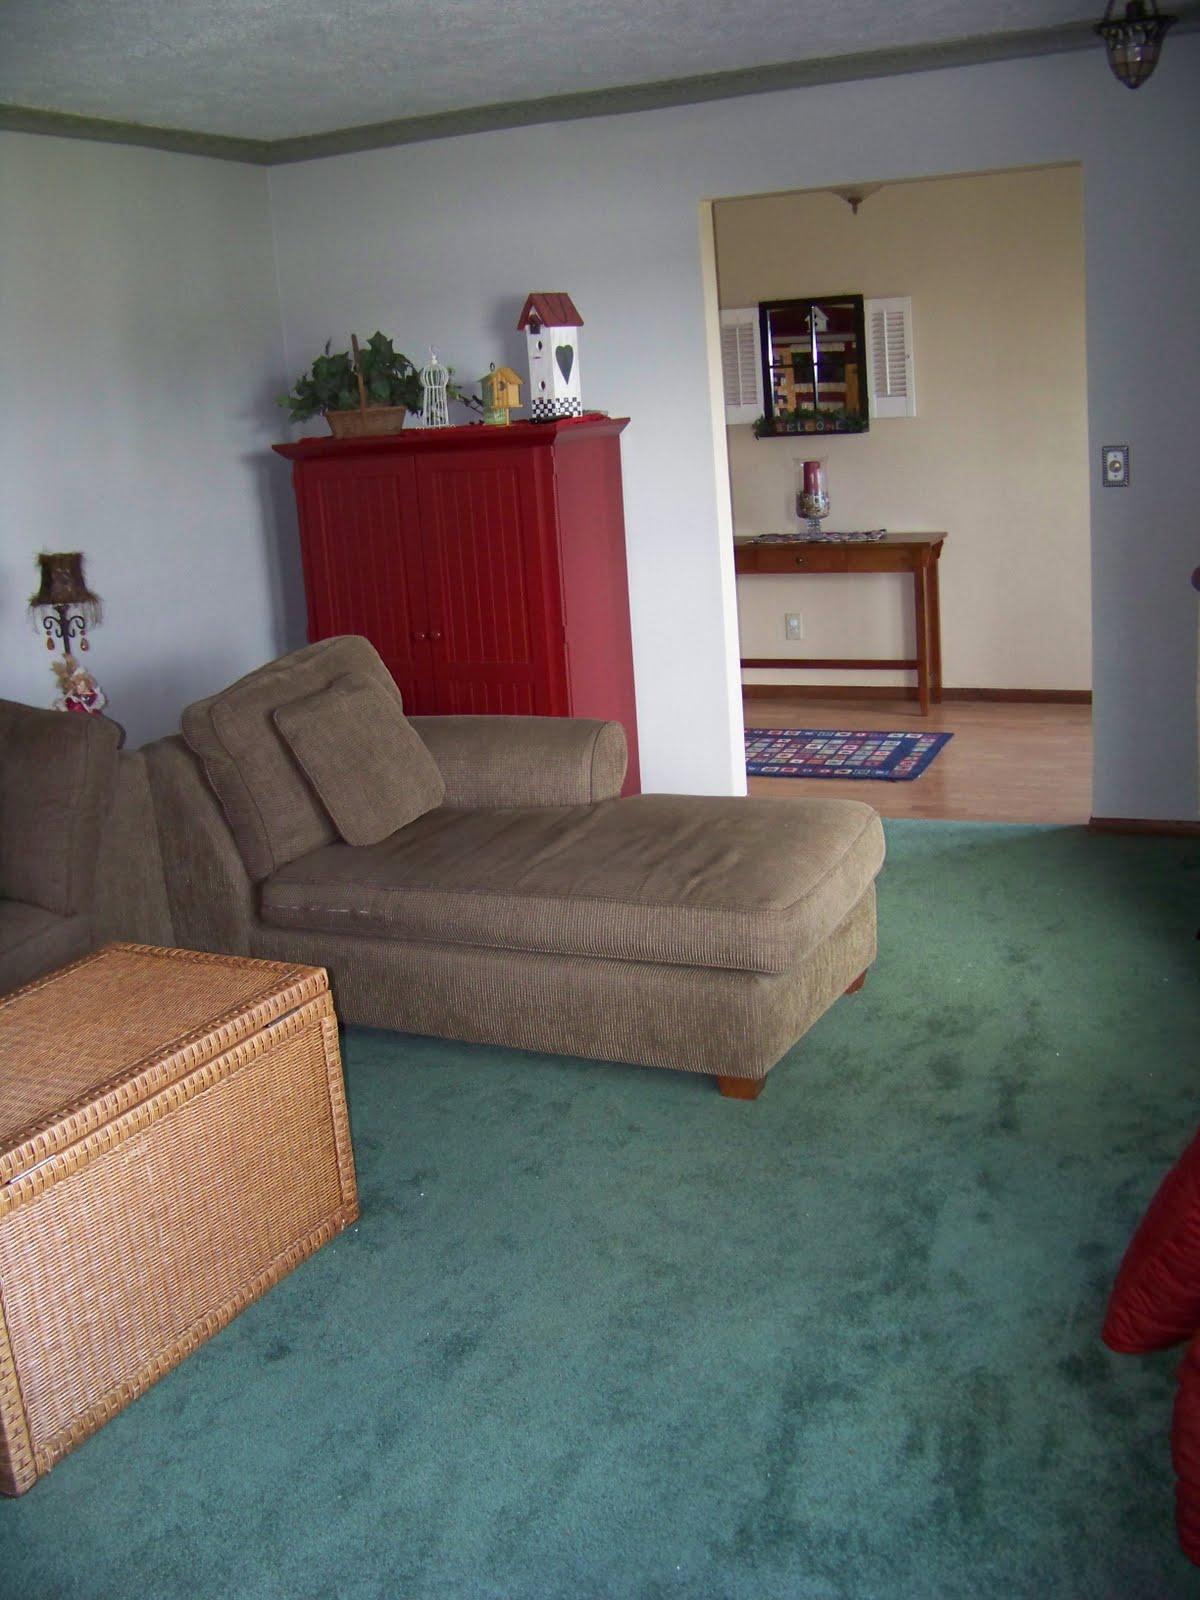 Decorating Advice Seafoam Green Carpet Decoratingspecial Com